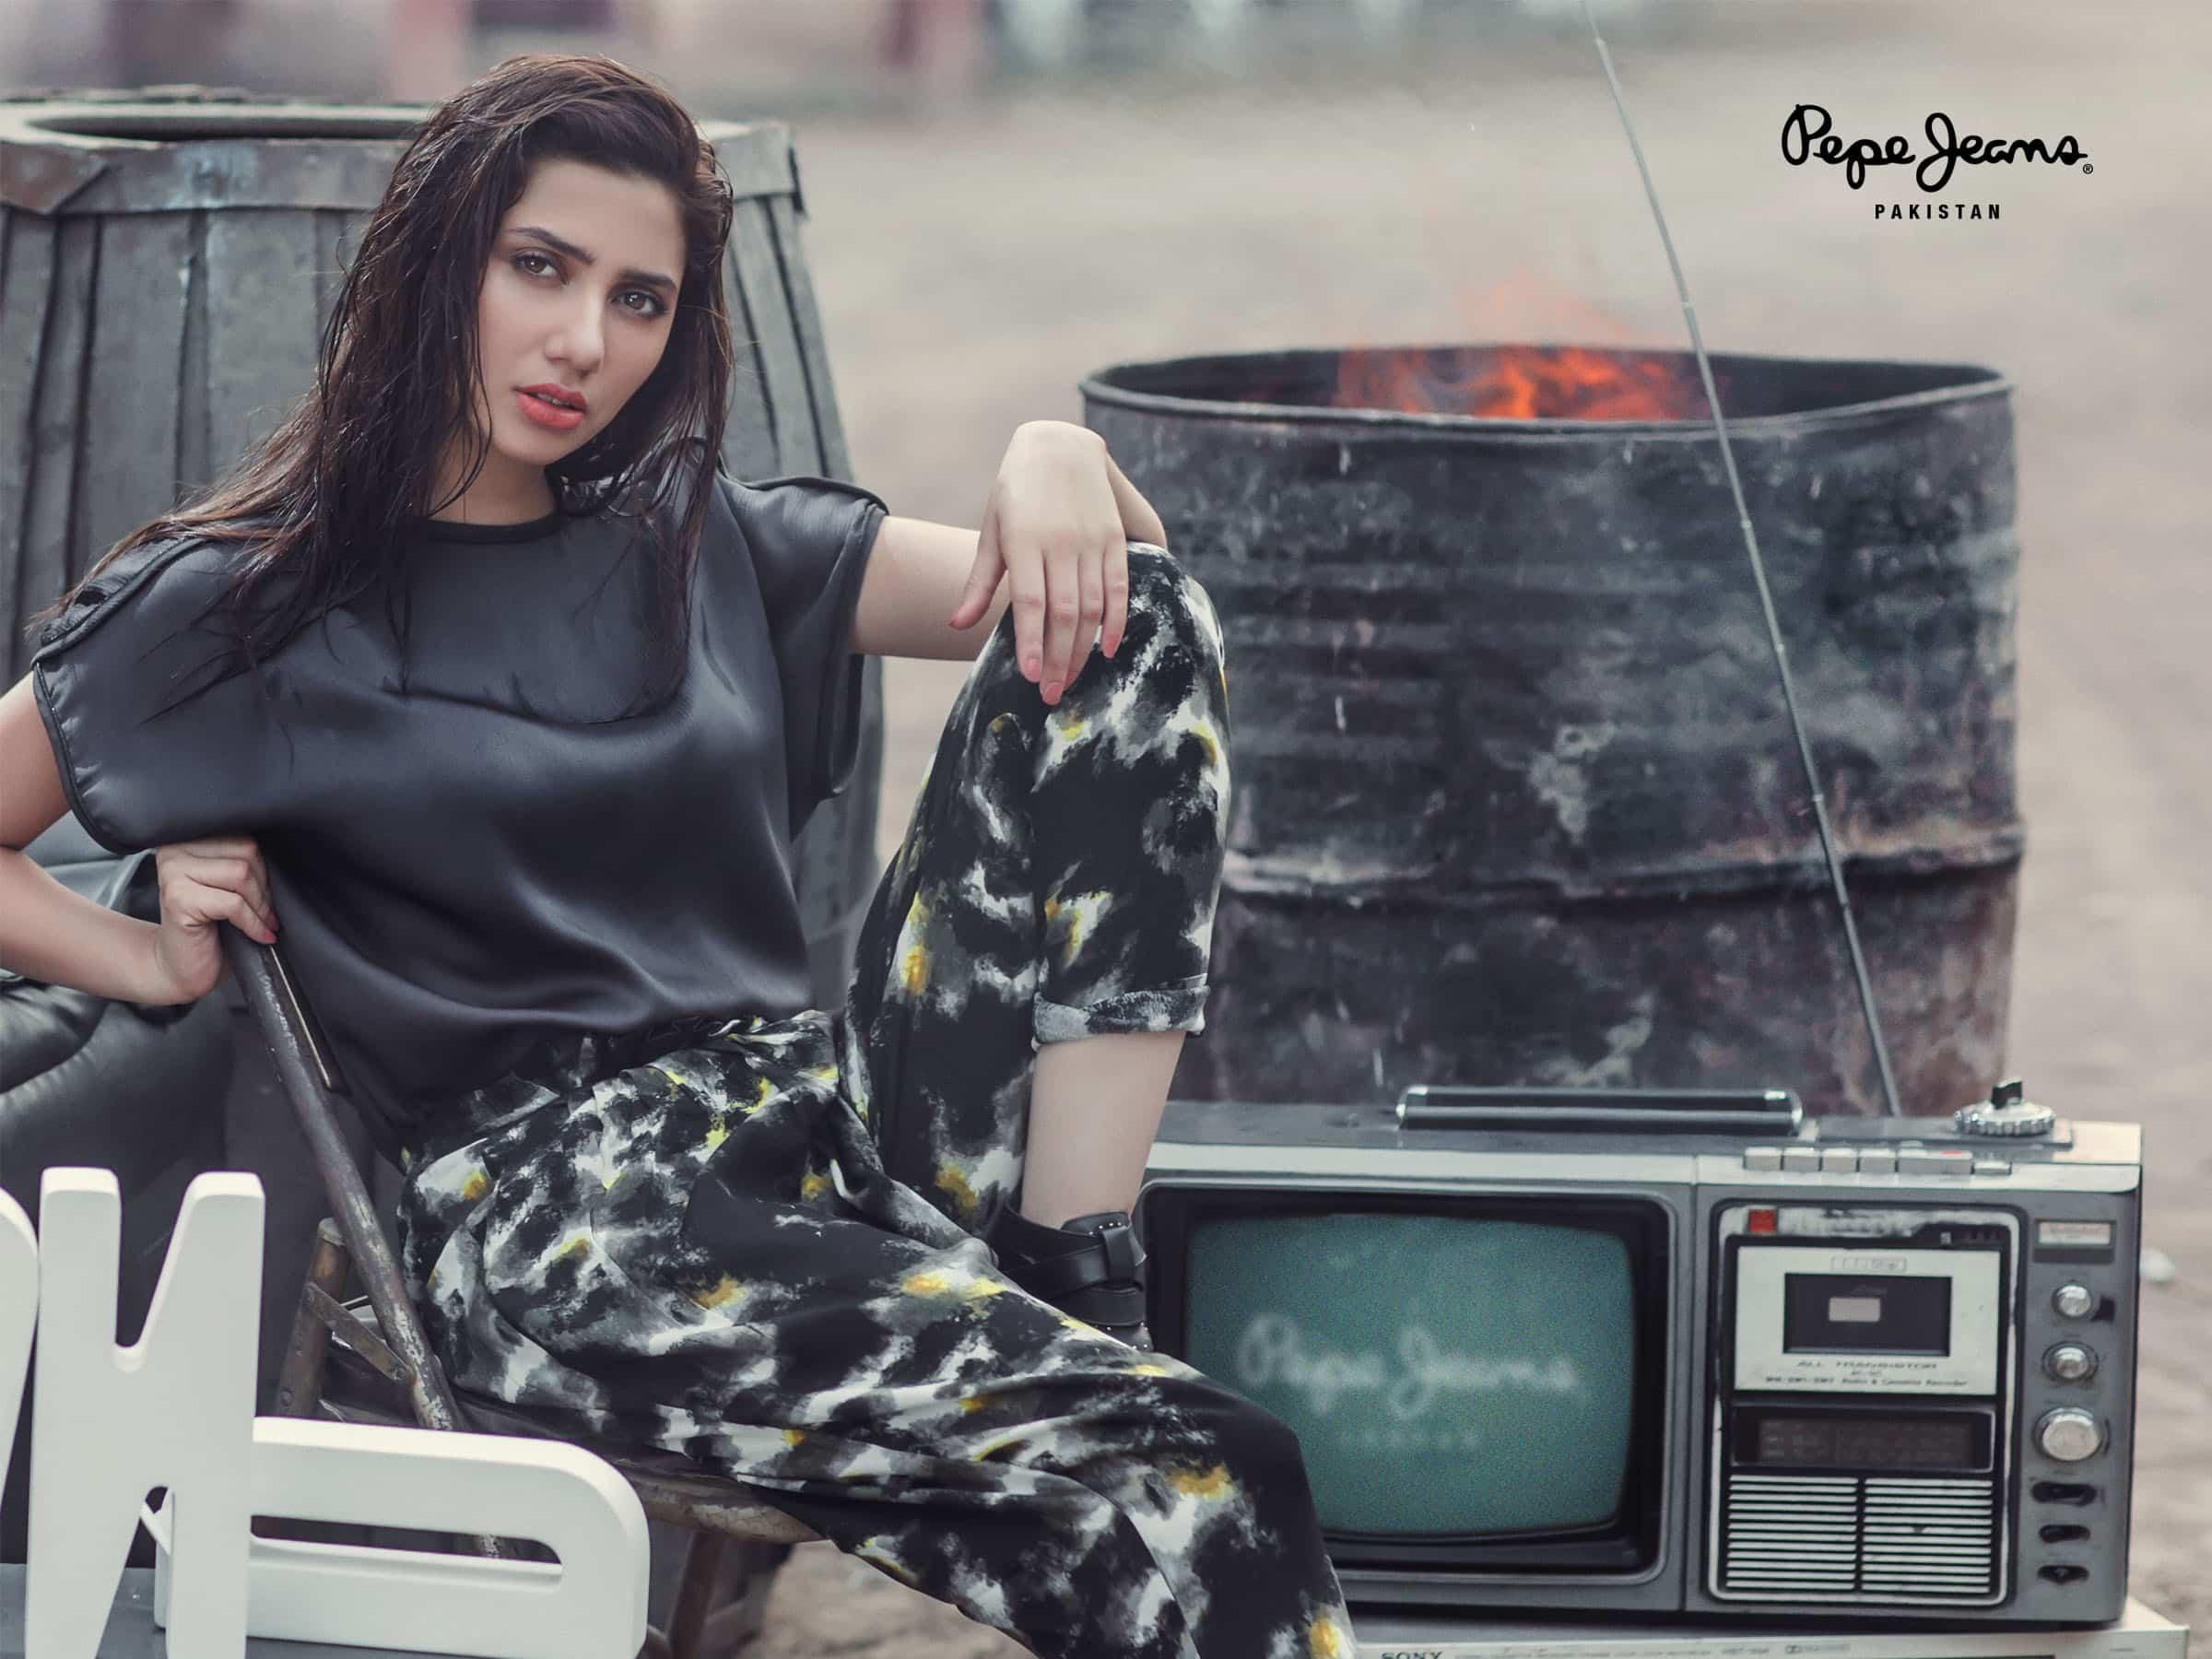 Mahira Khan for Pepe Jeans Pakistan Winter 2015 Campaign – #MKLovesPepe (7)